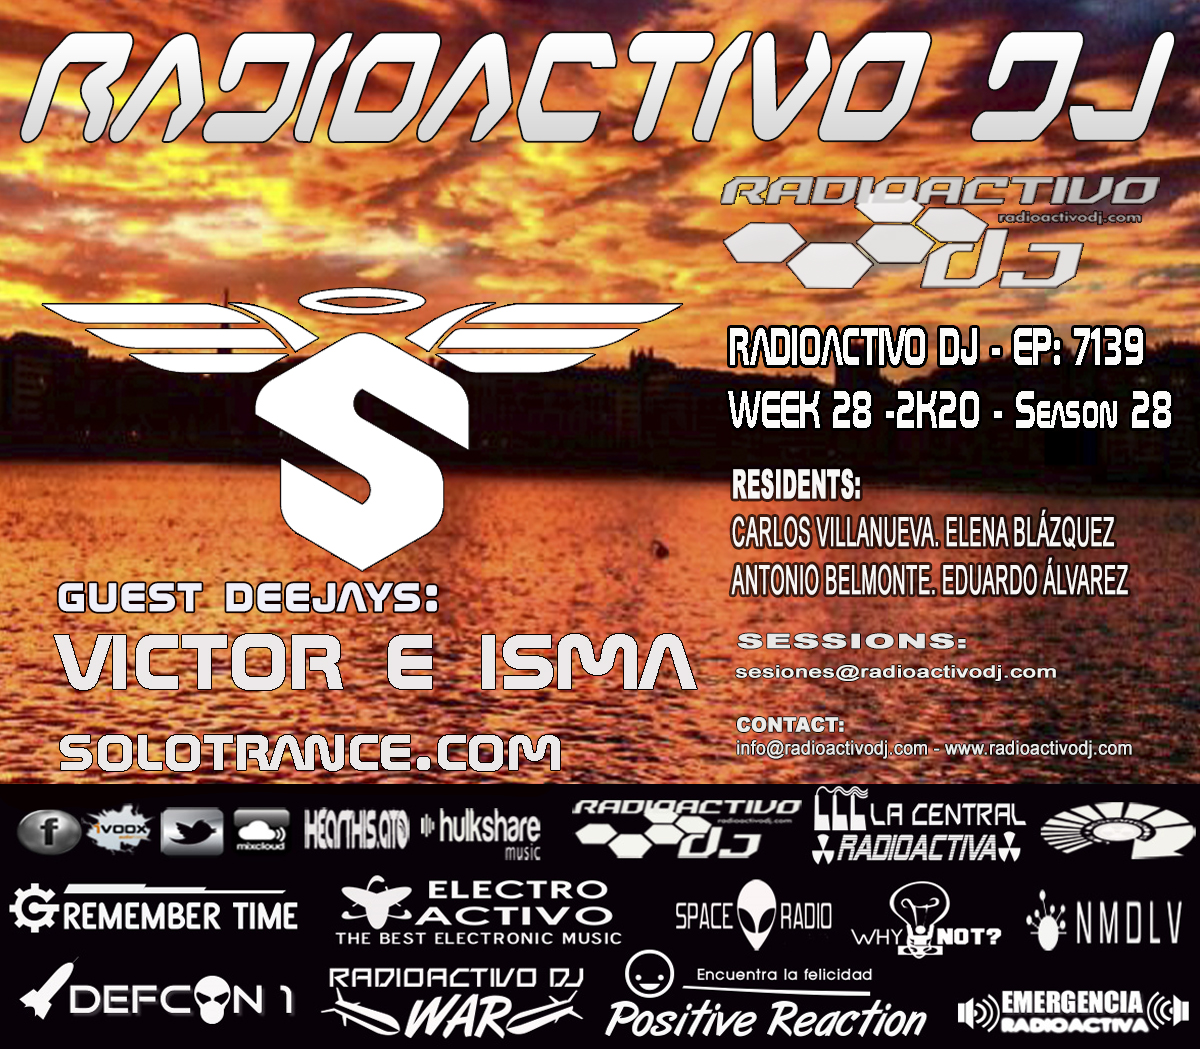 RADIOACTIVO-DJ-28-2020